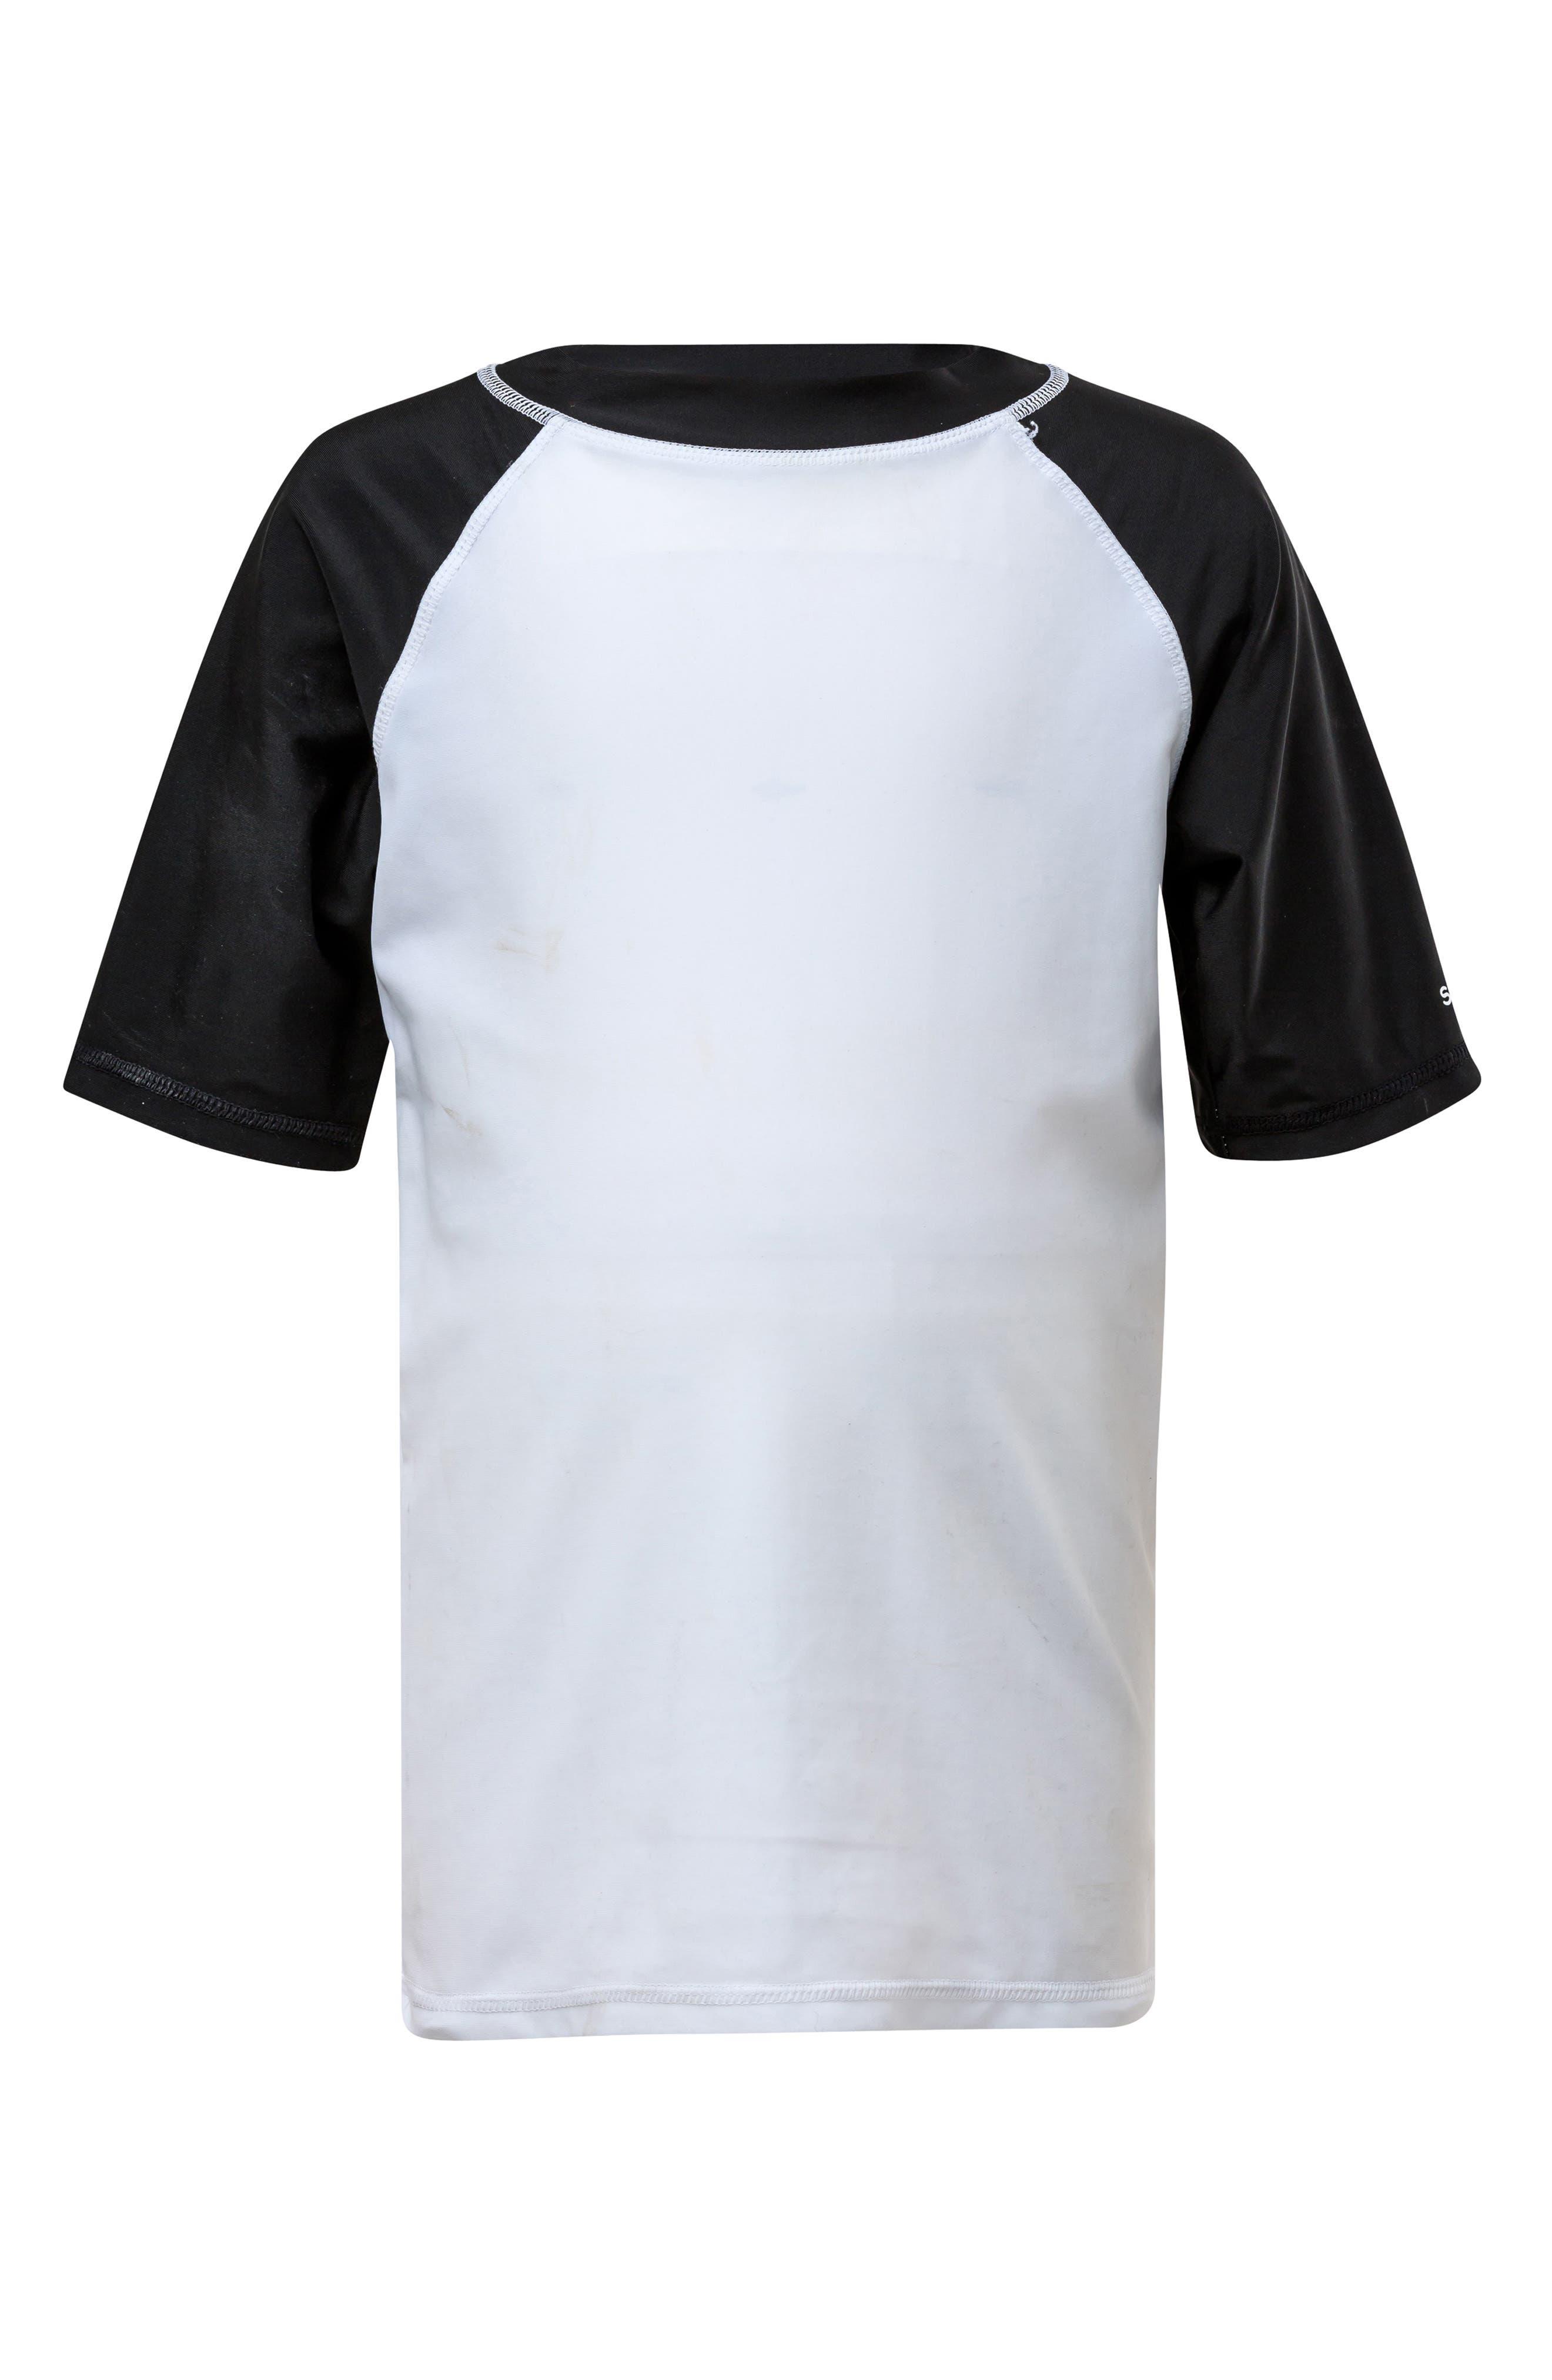 Raglan Rashguard,                         Main,                         color, WHITE W/ BLACK